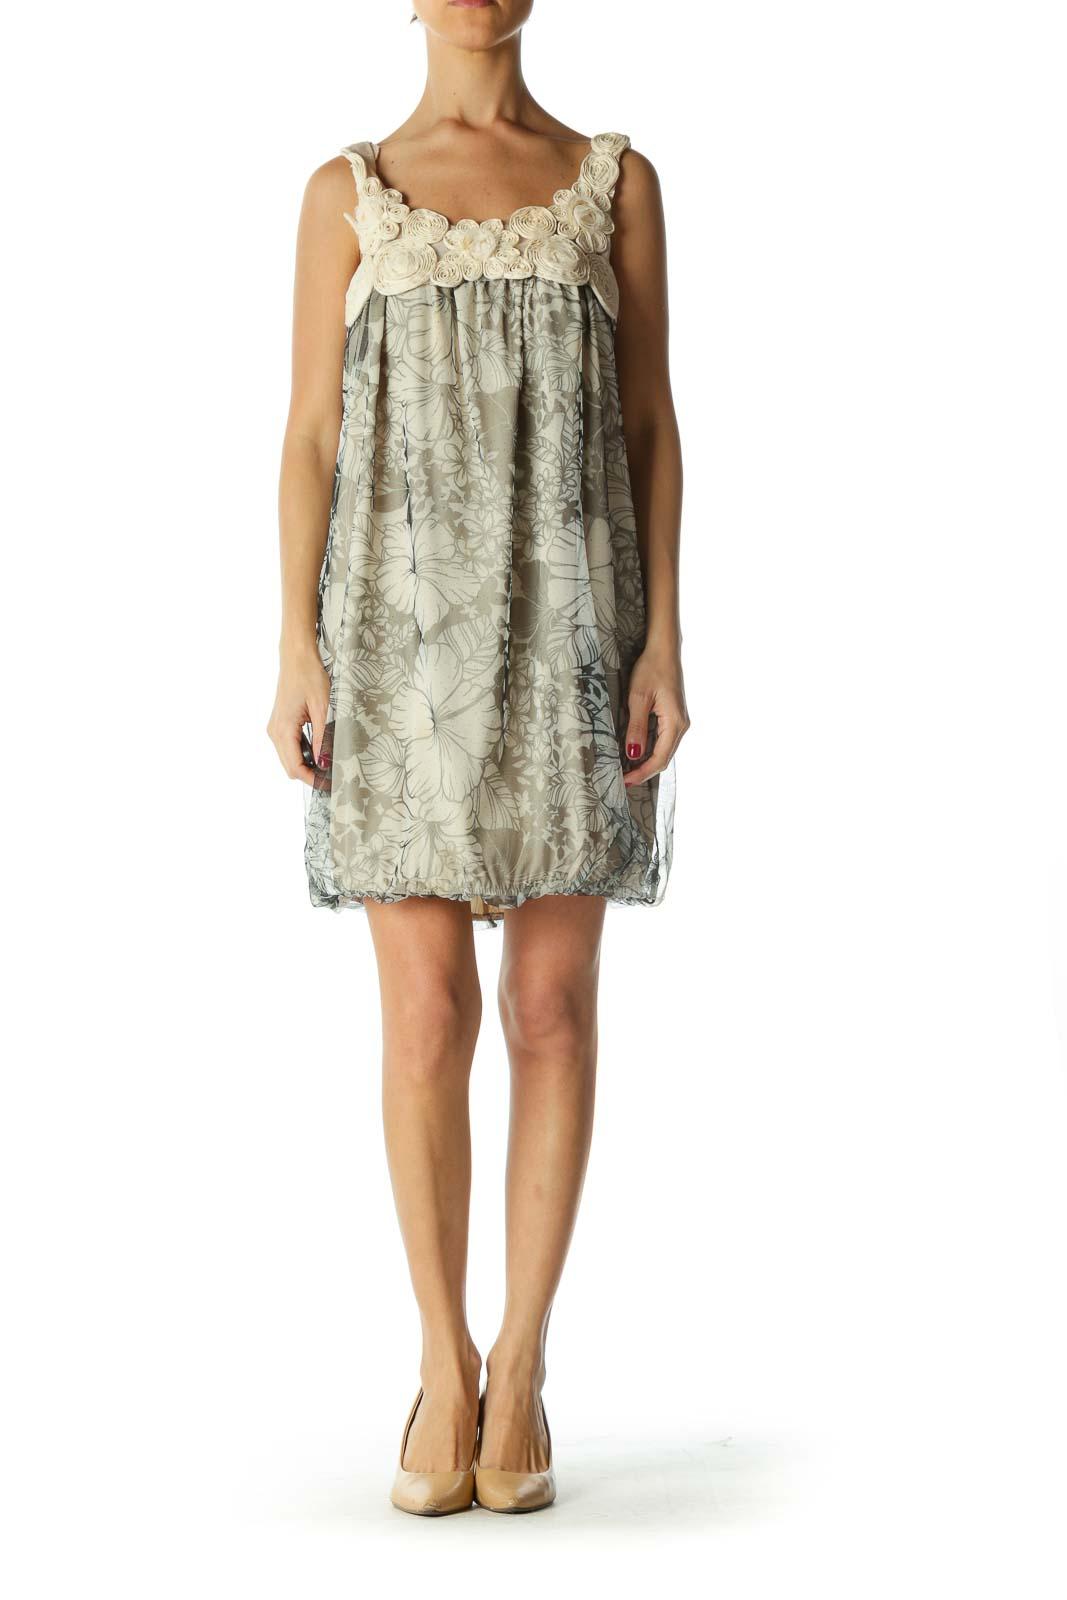 Black Cream Floral Print Sparkle Mixed-Media Dress